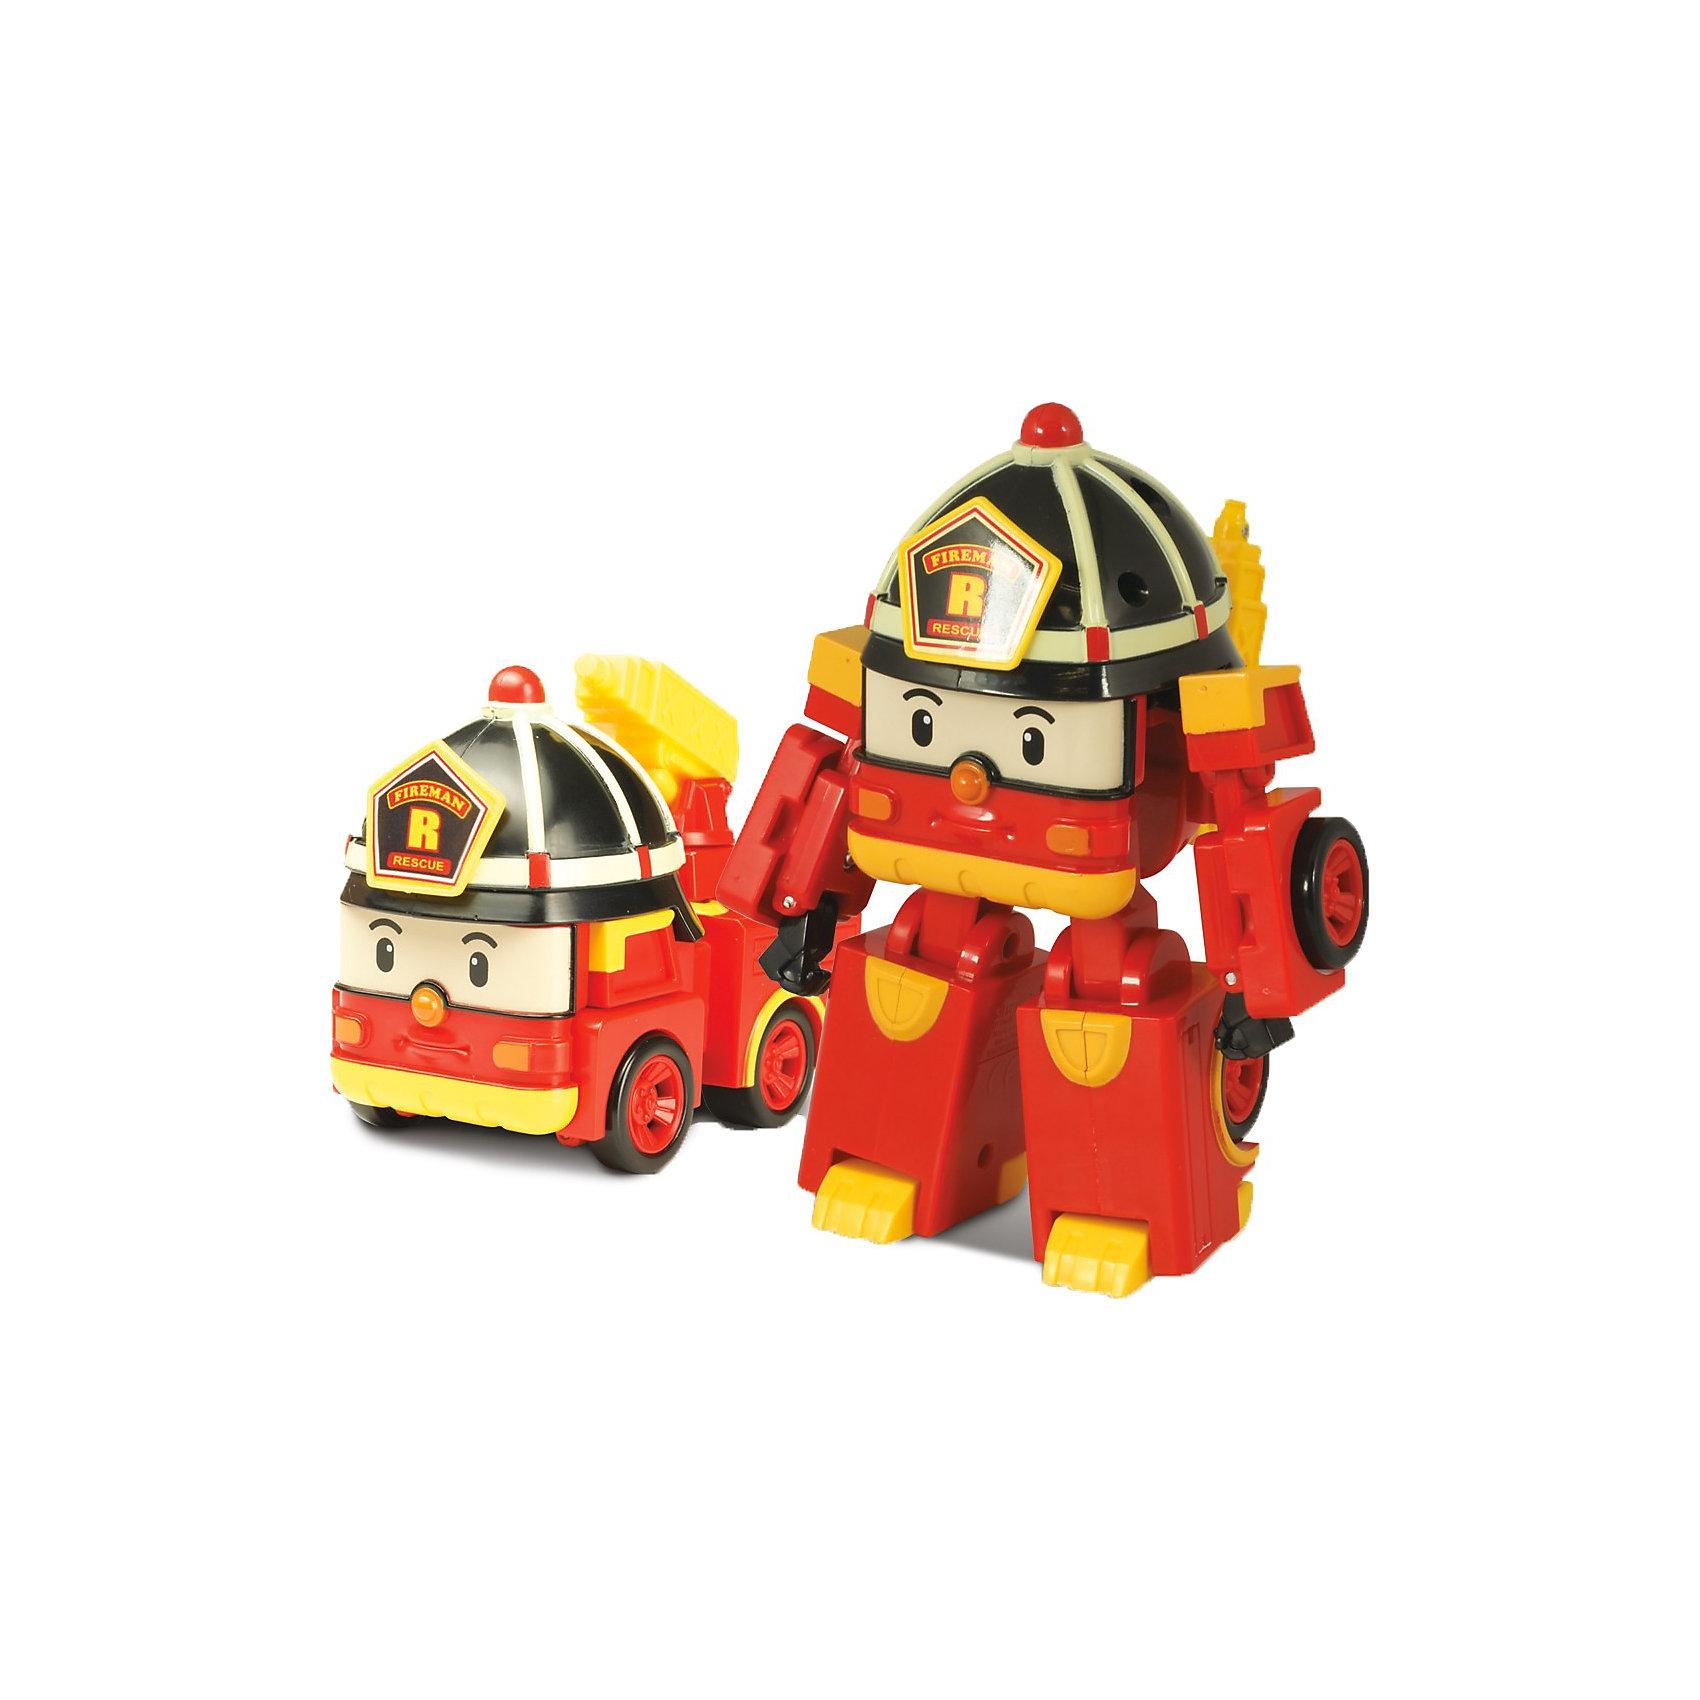 Silverlit Игрушка Рой трансформер, Робокар Поли развивающие игрушки мякиши кубики 2 шт